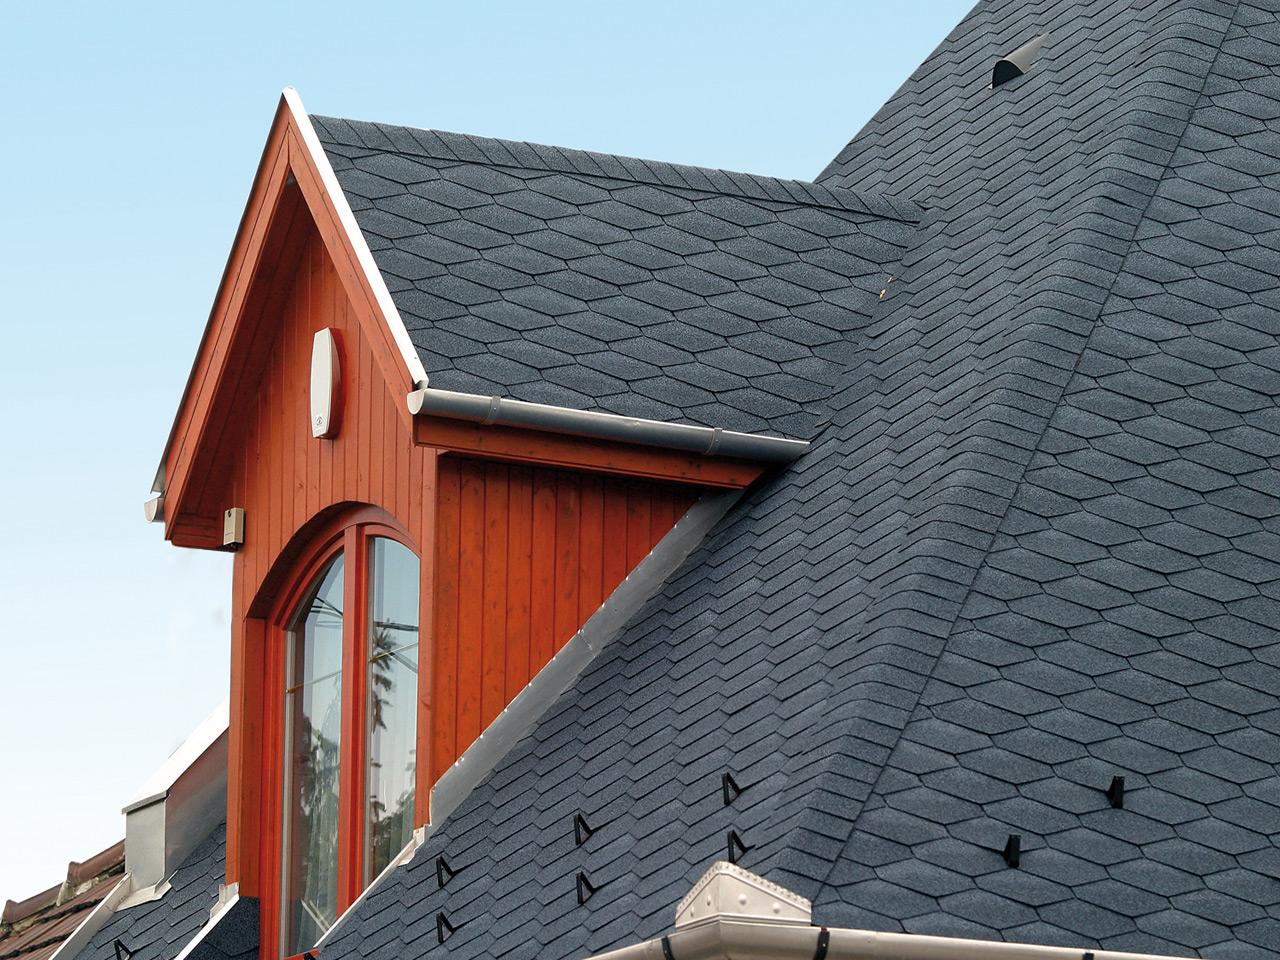 شینگل دیامانت شیلد-پوشش سقف شیبدار